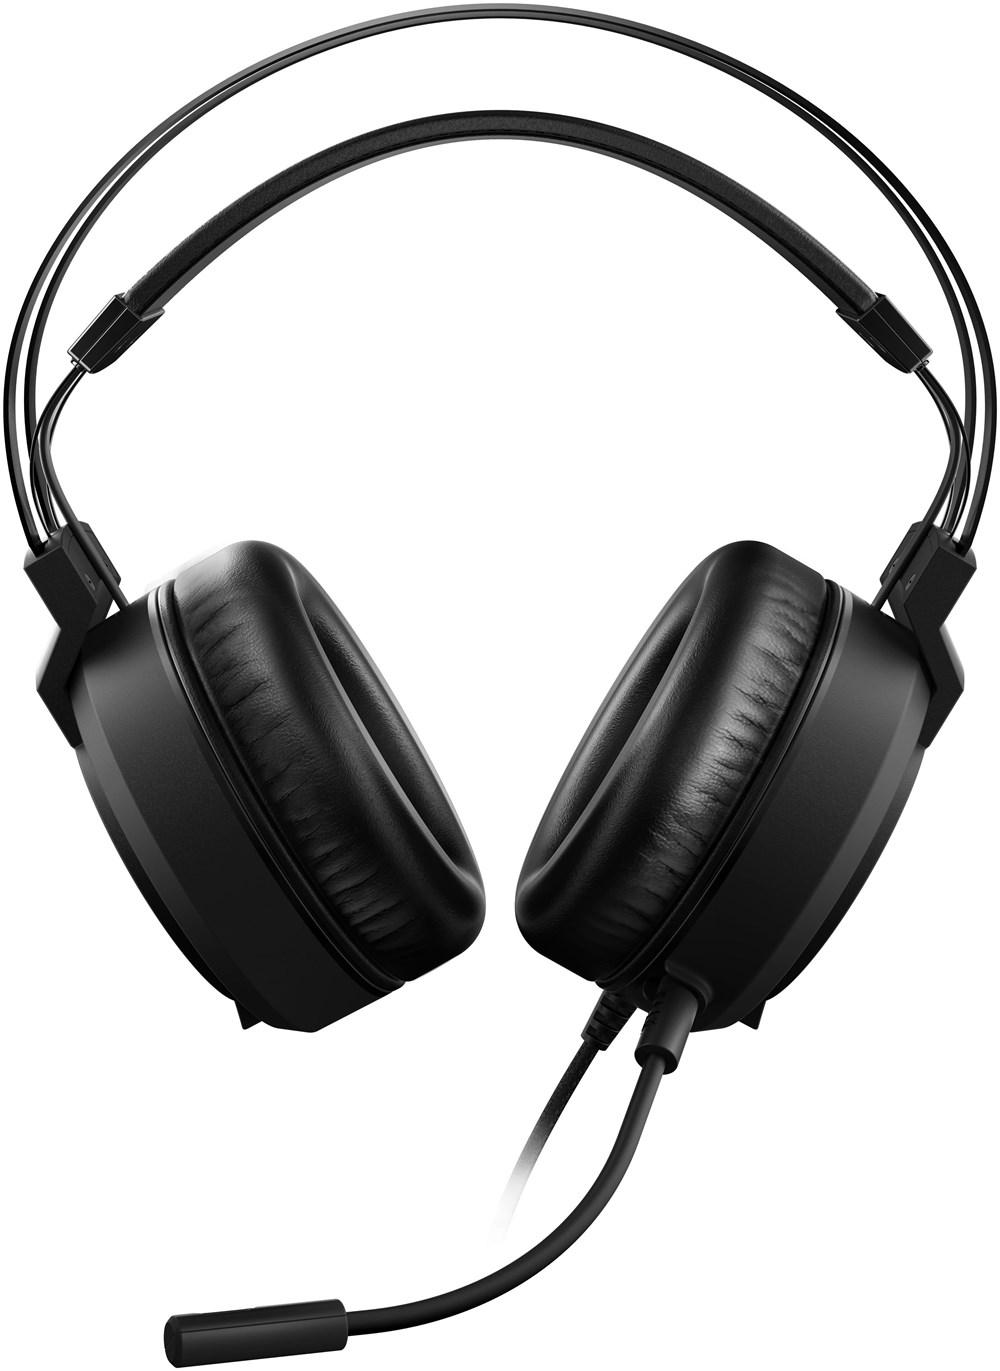 Tesoro Olivant Pro 7.1 Virtuell Surround Sound Gaming Headset